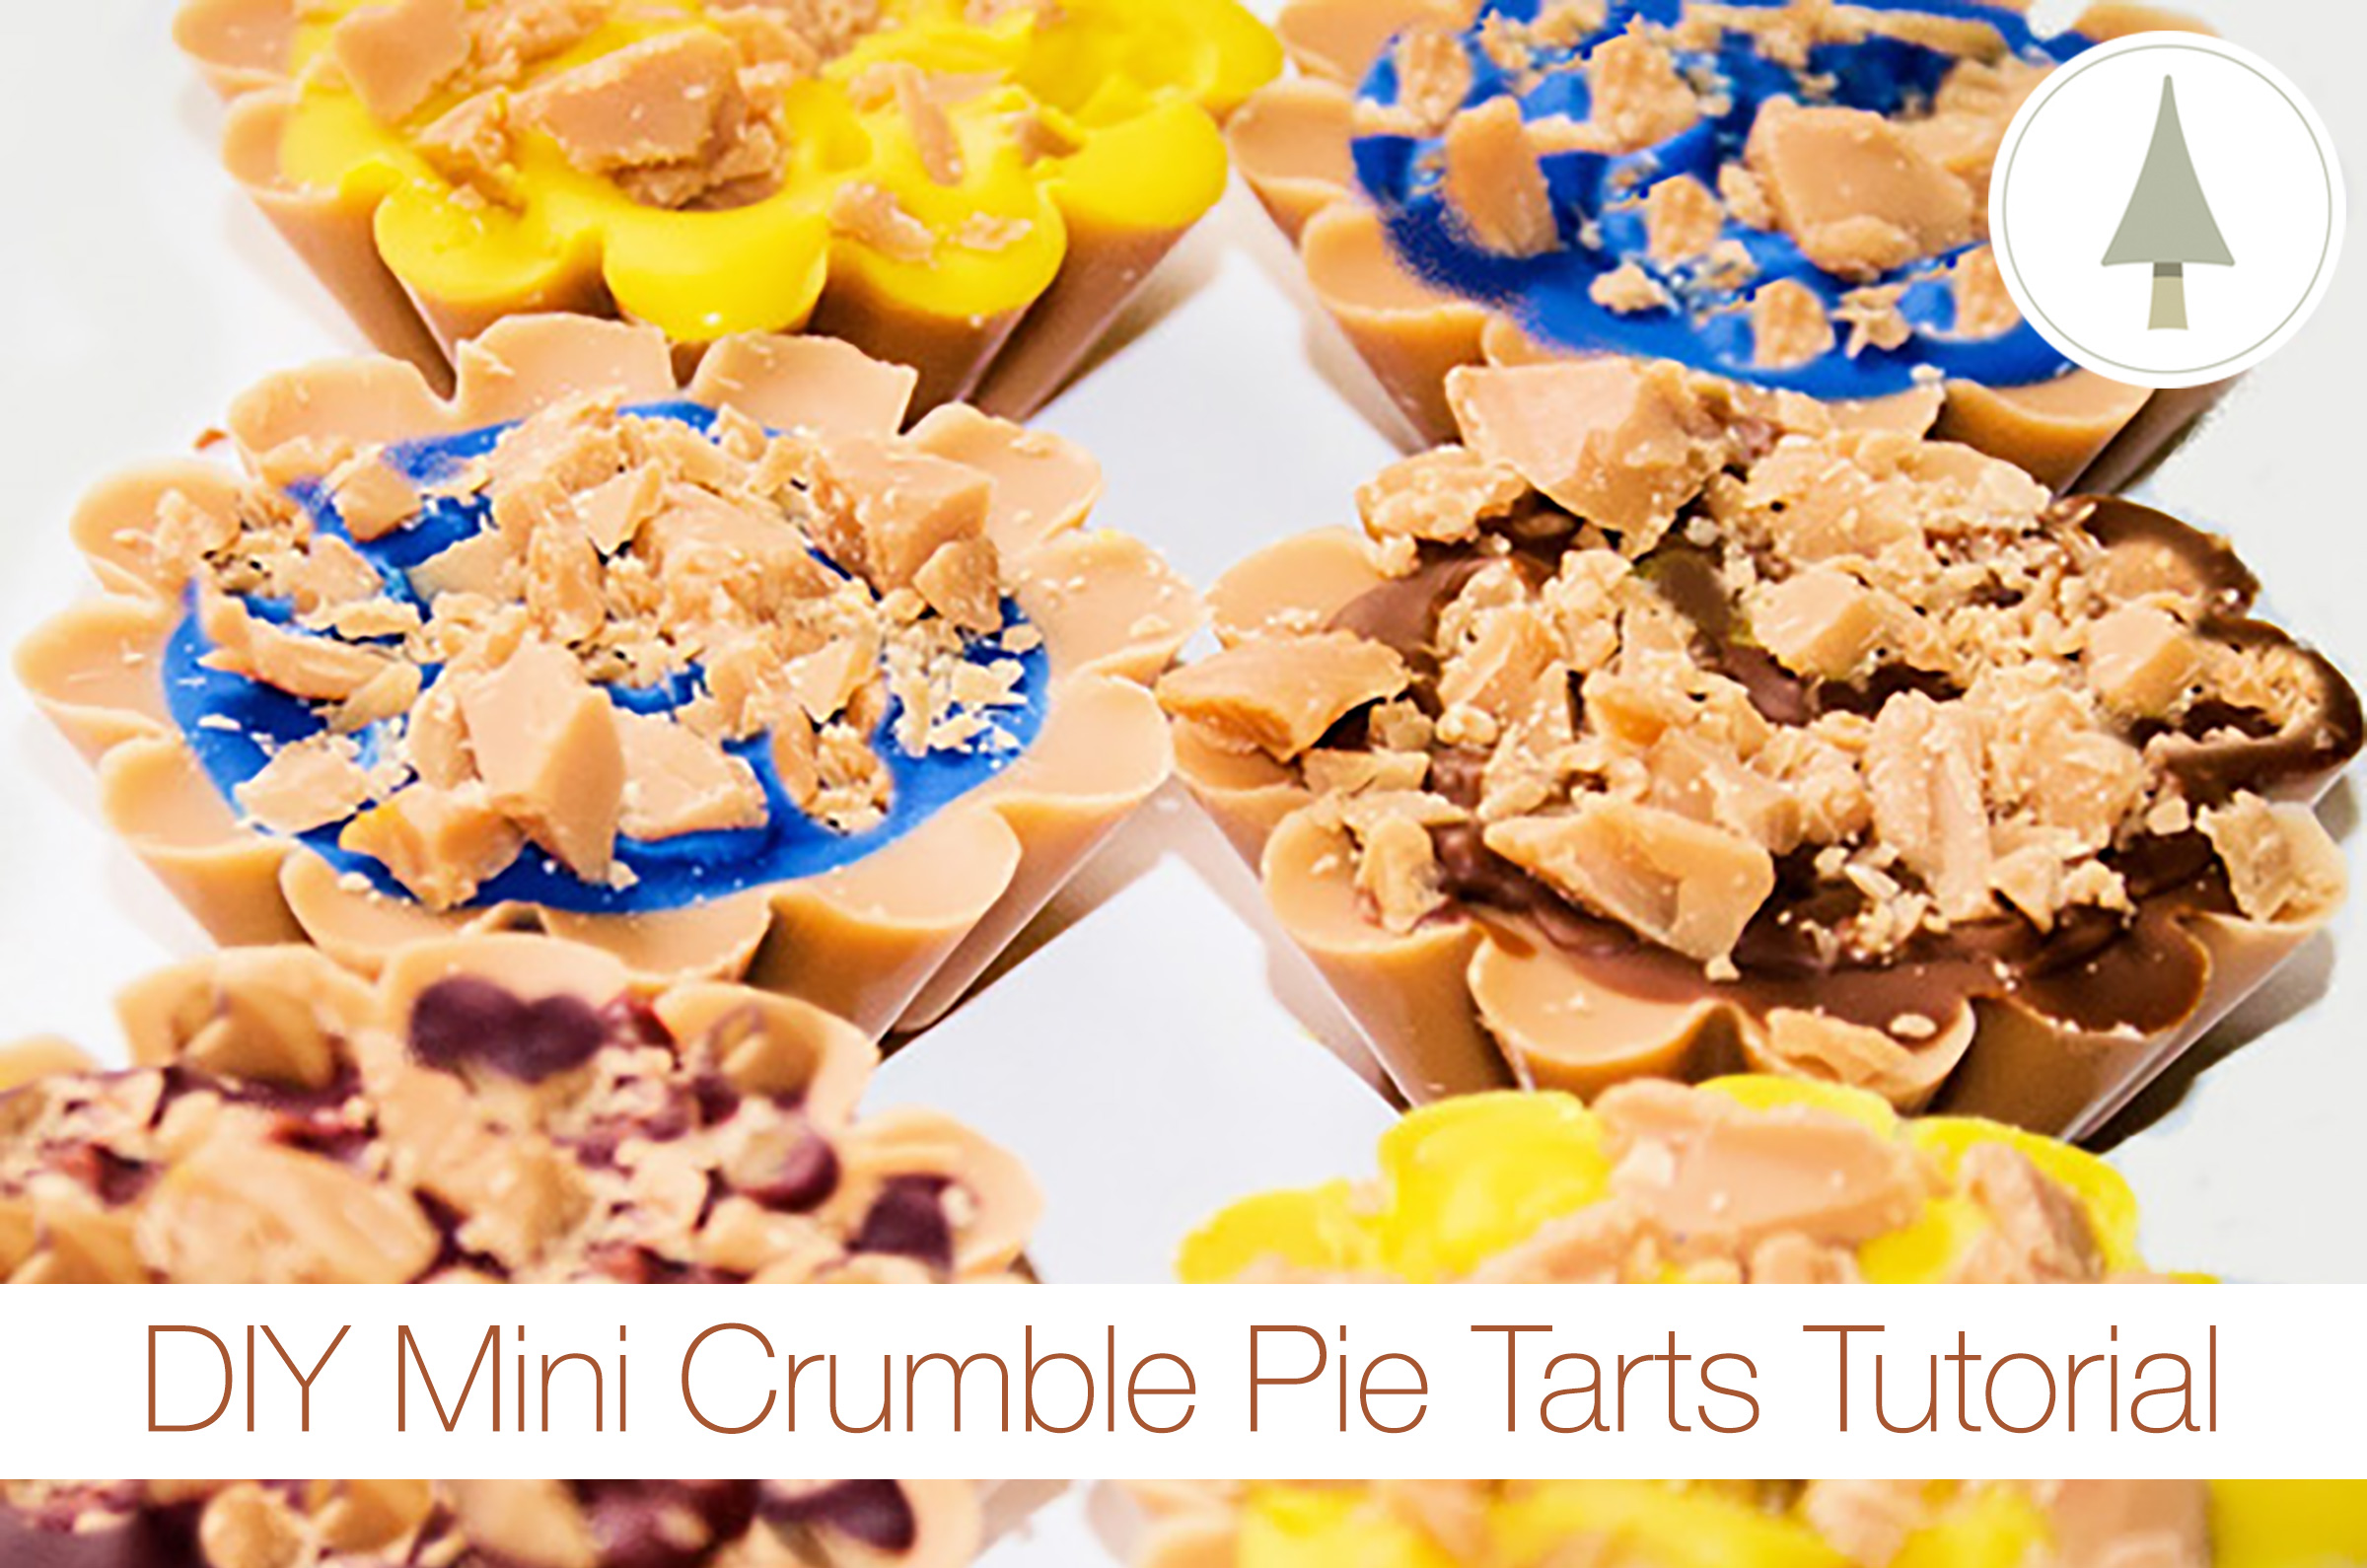 mini crumble pie tarts